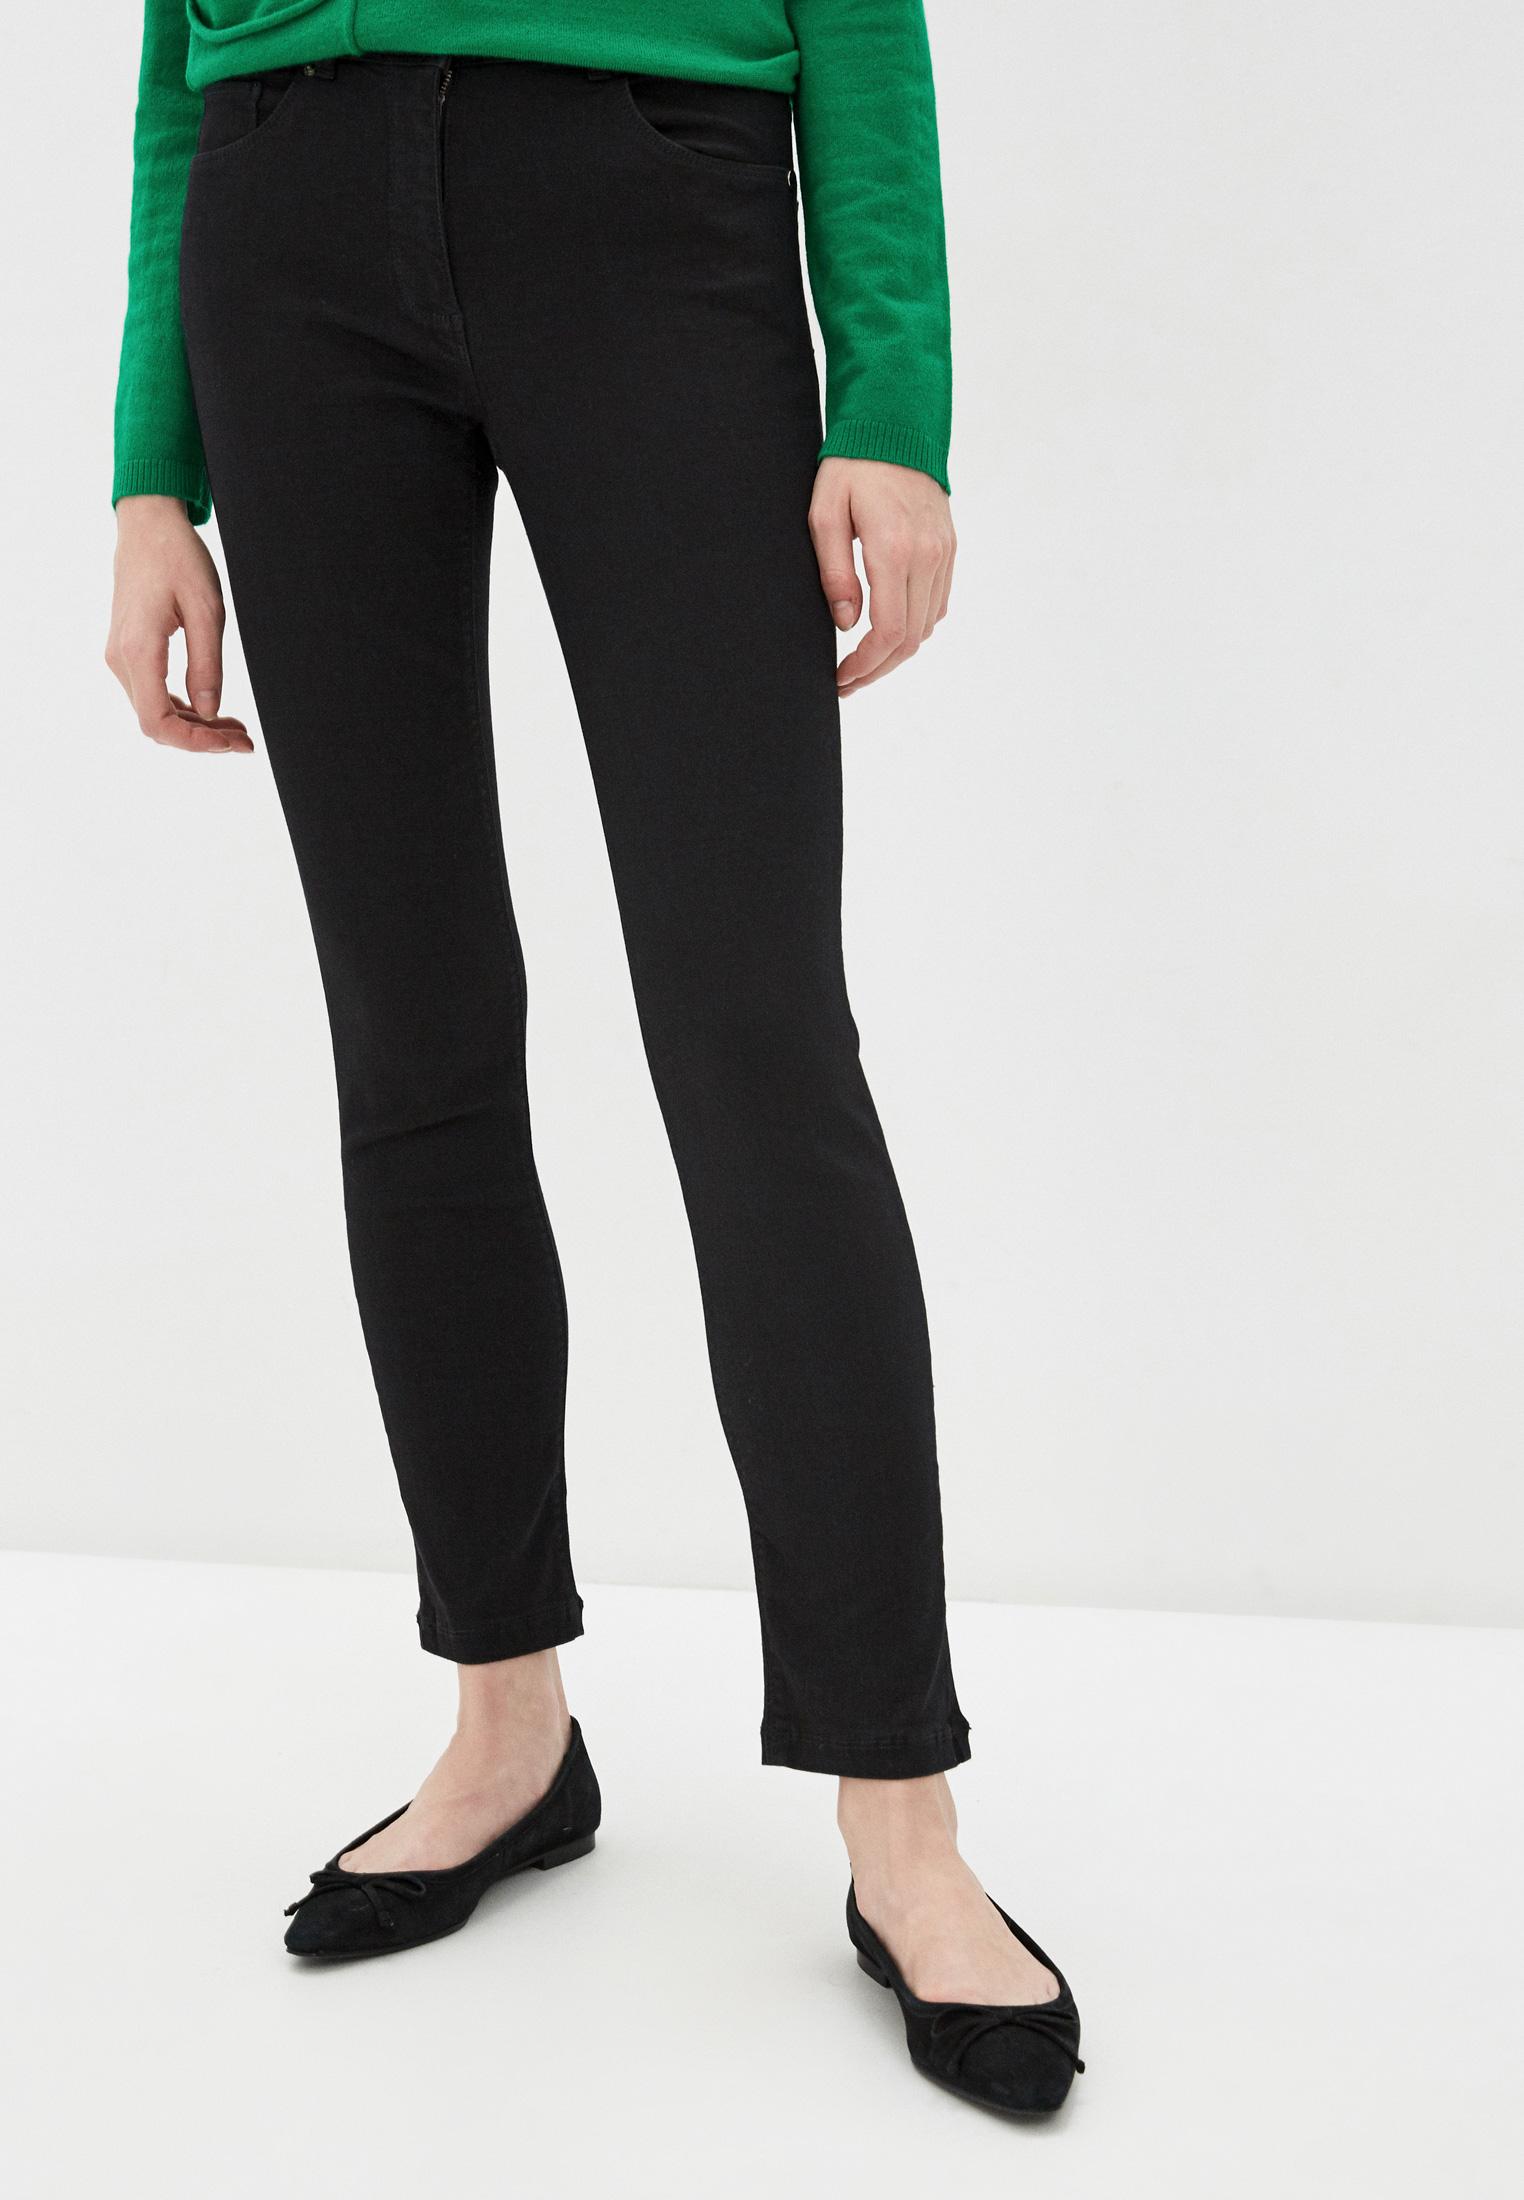 Женские джинсы Betty Barclay 3961/1806